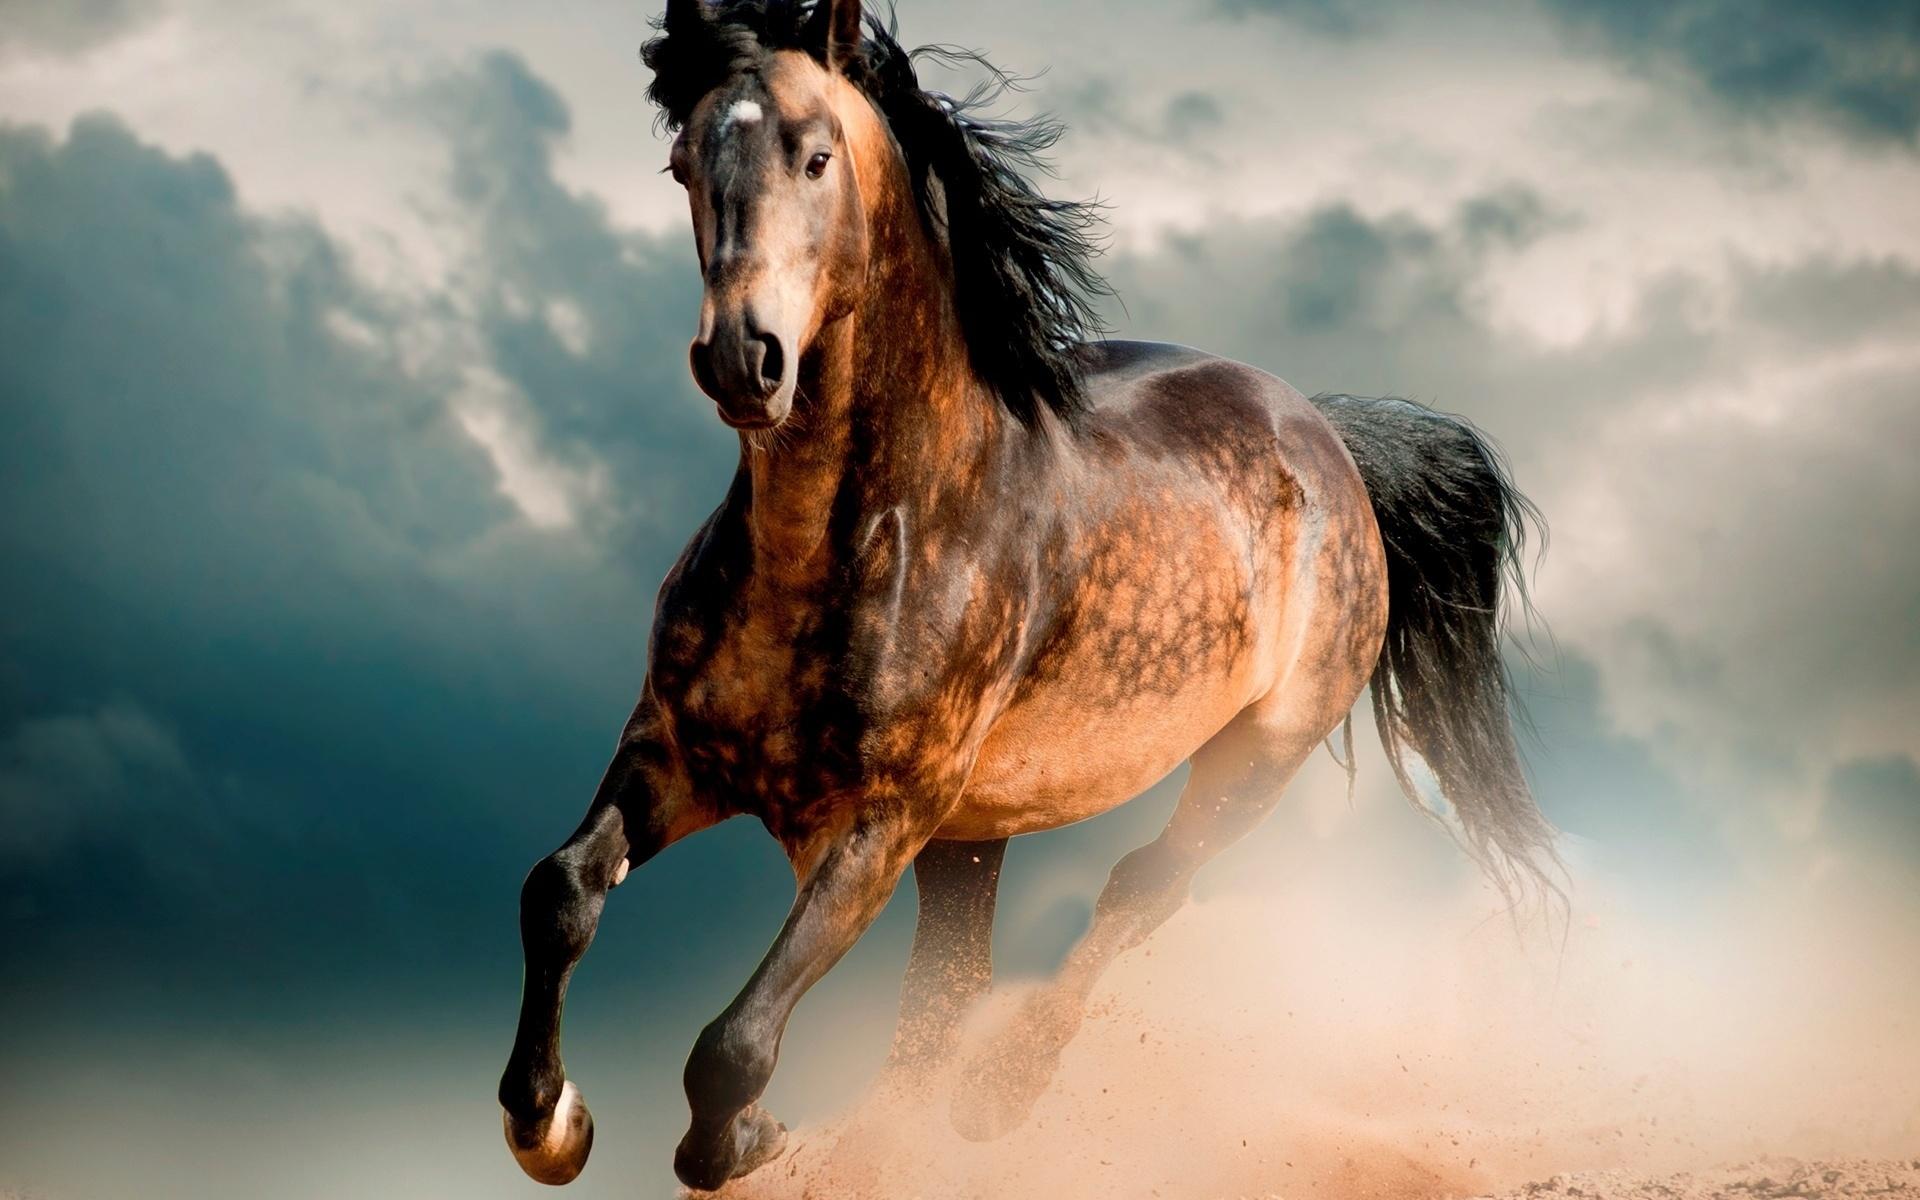 фото картинки лошади мустанг услугам